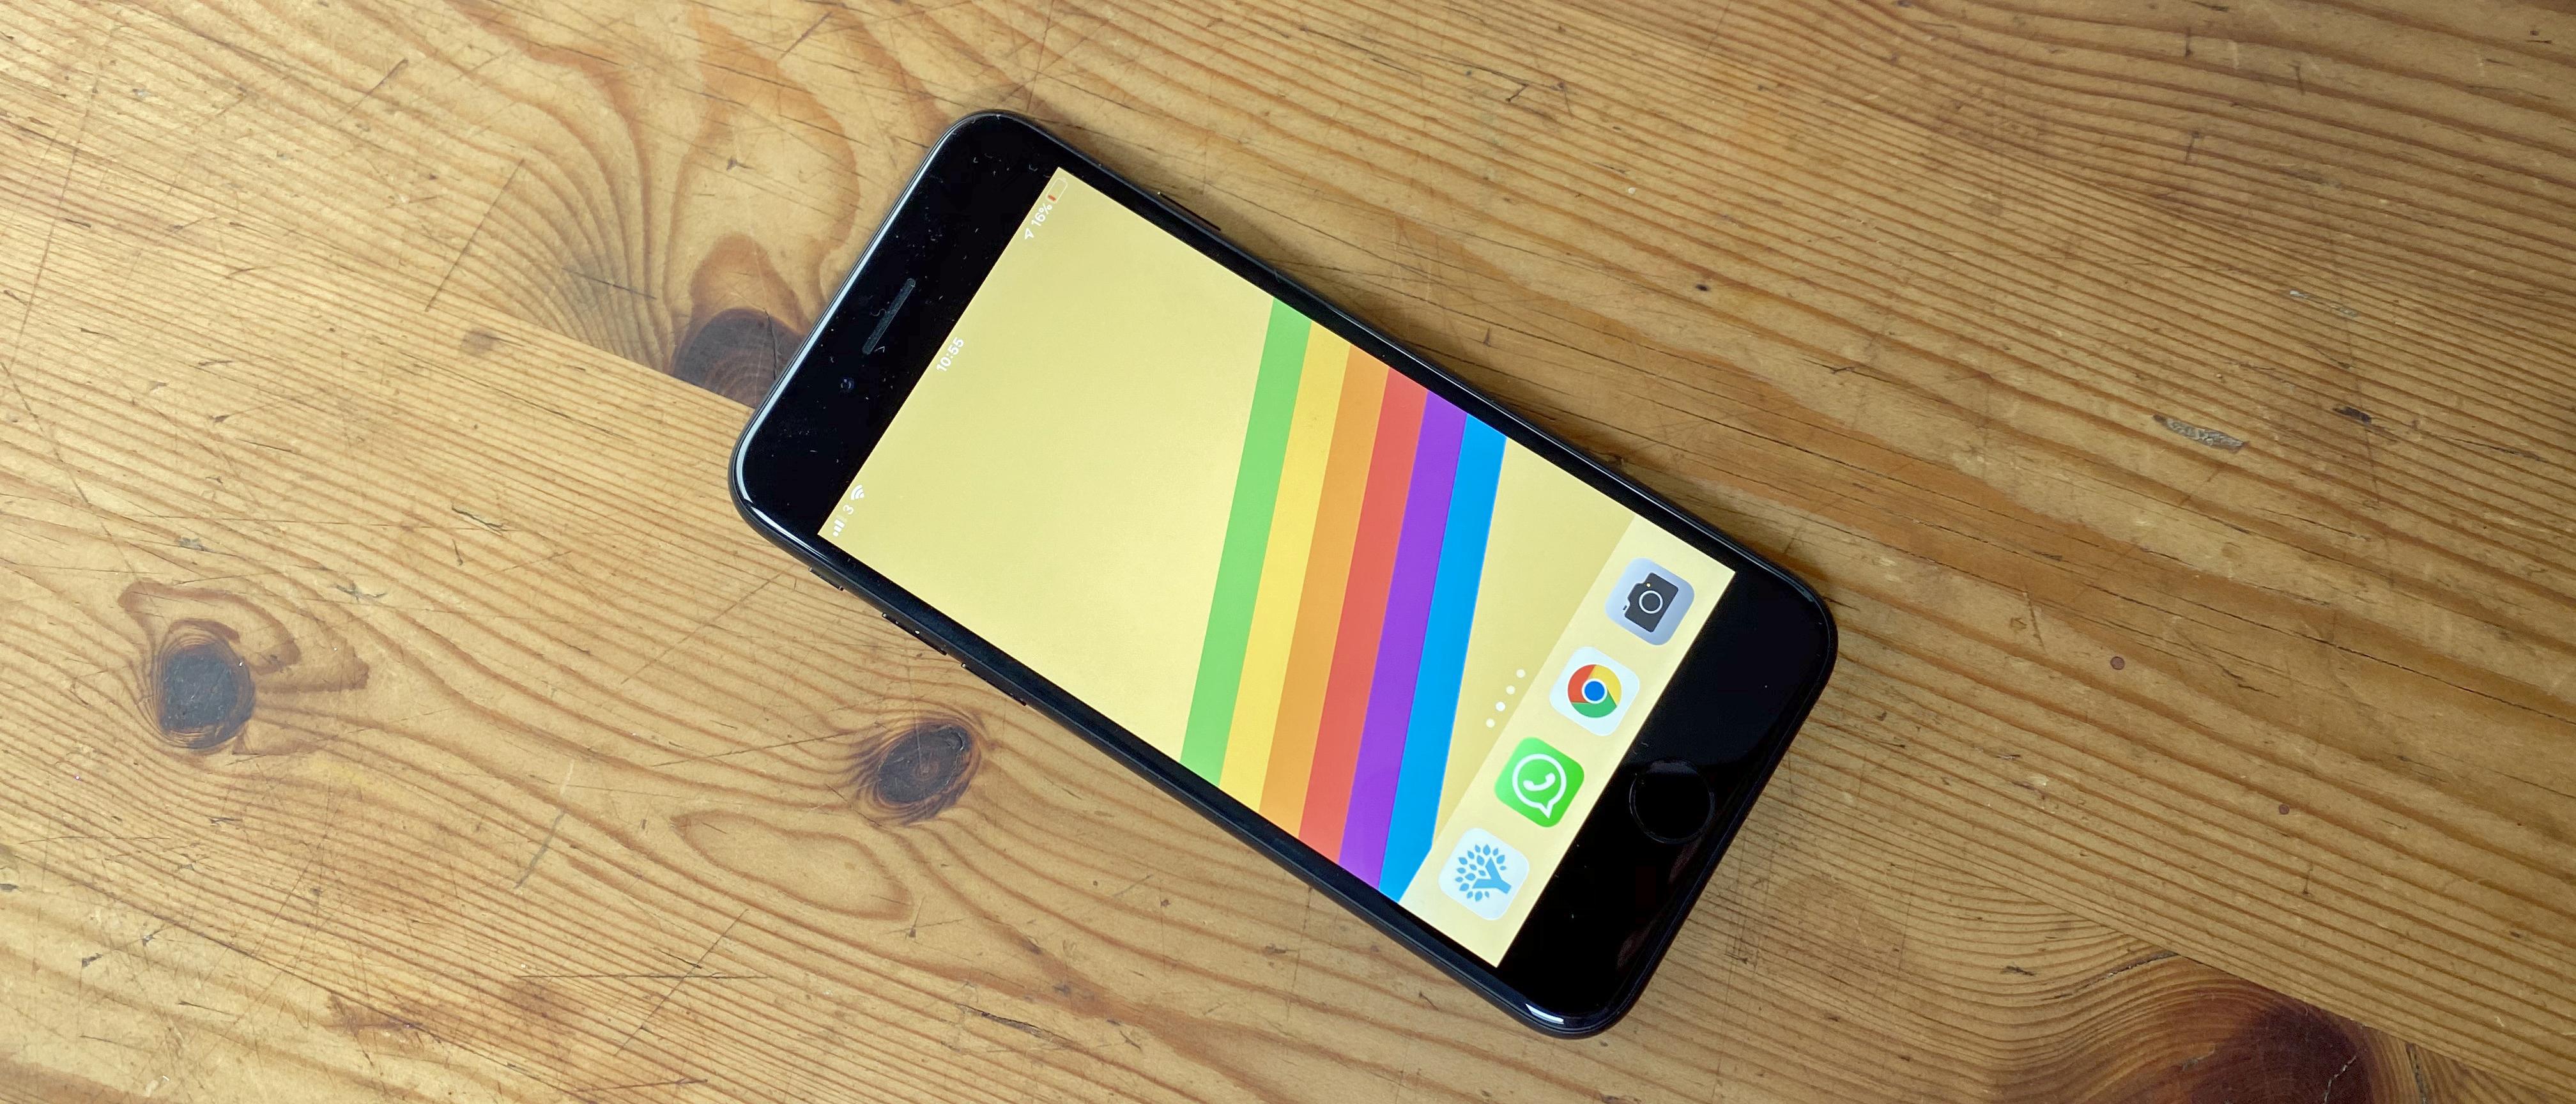 Iphone Se Review 2020 Apple S Cheaper Iphone Choice Techradar